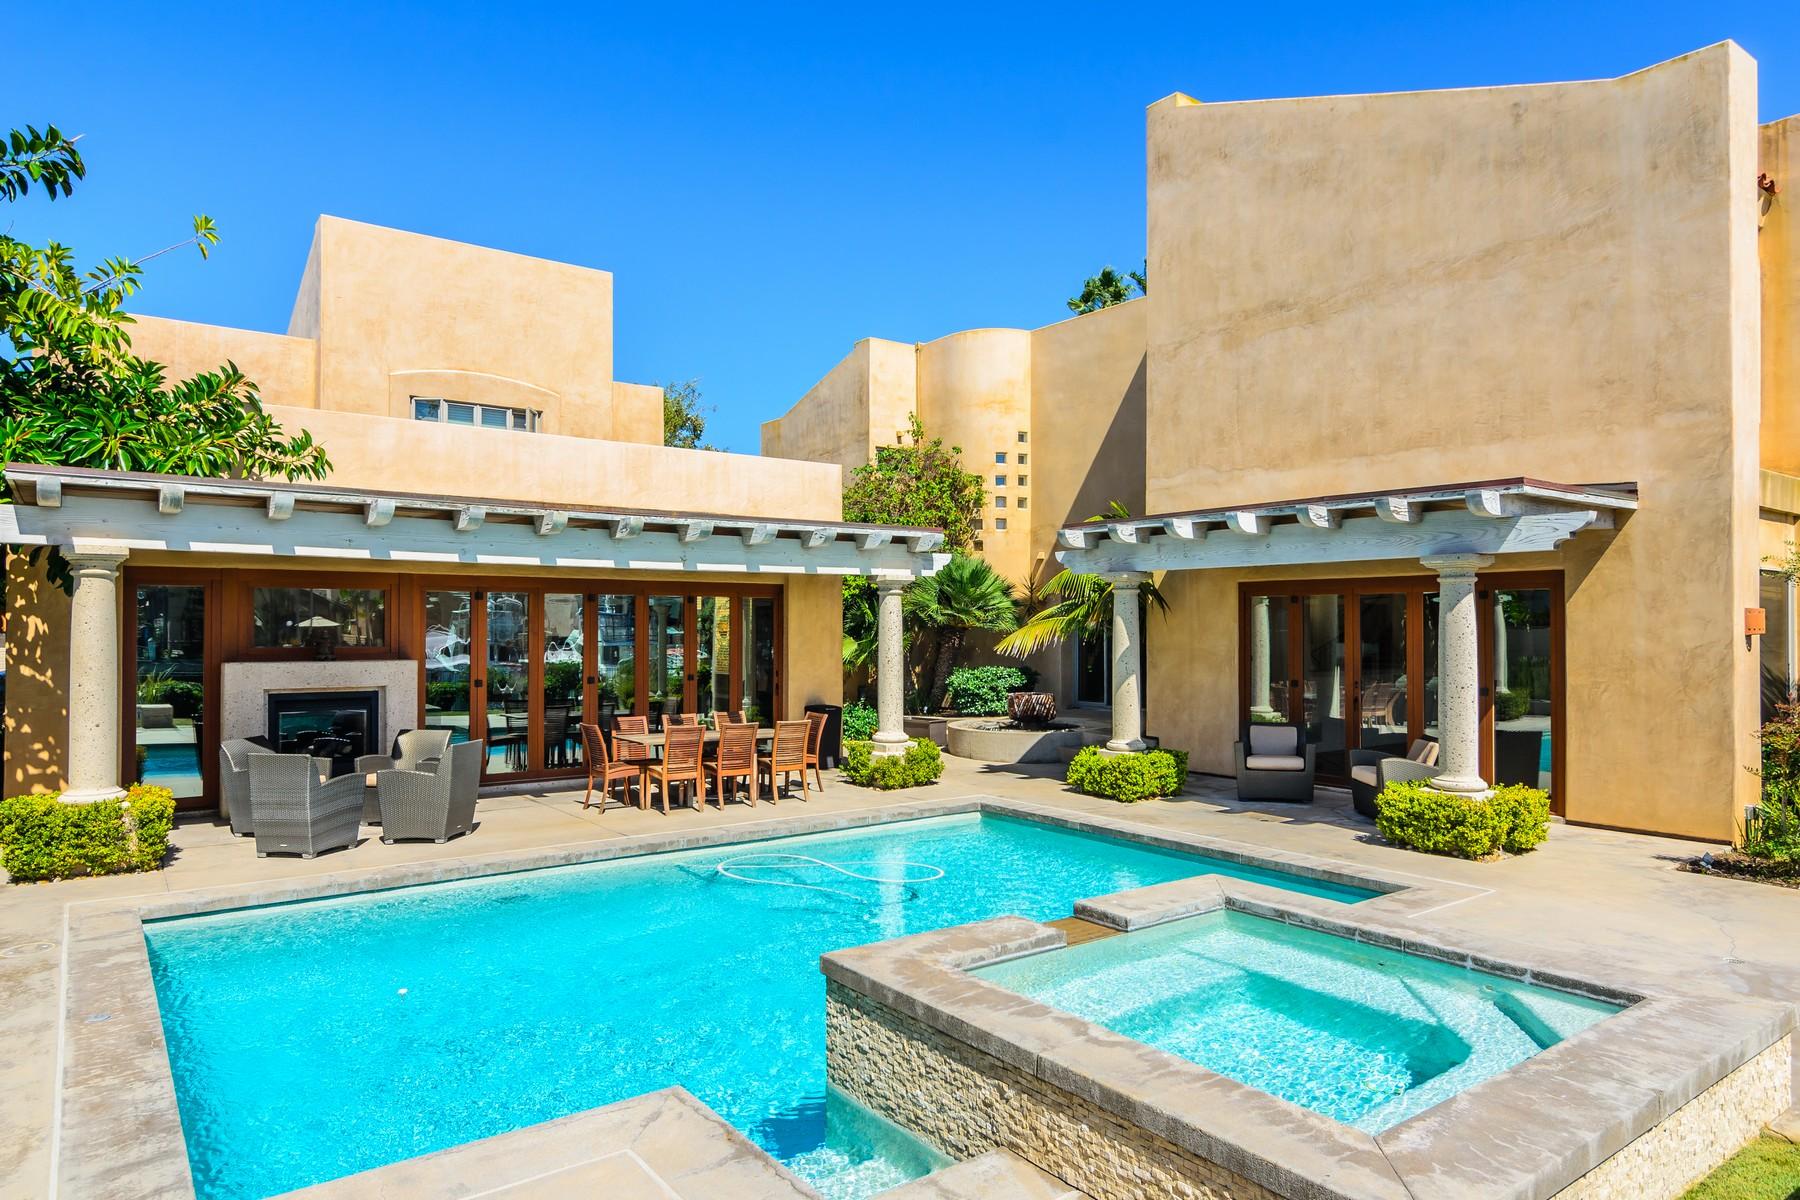 Single Family Home for Sale at 6 Sixpence Coronado, California 92118 United States